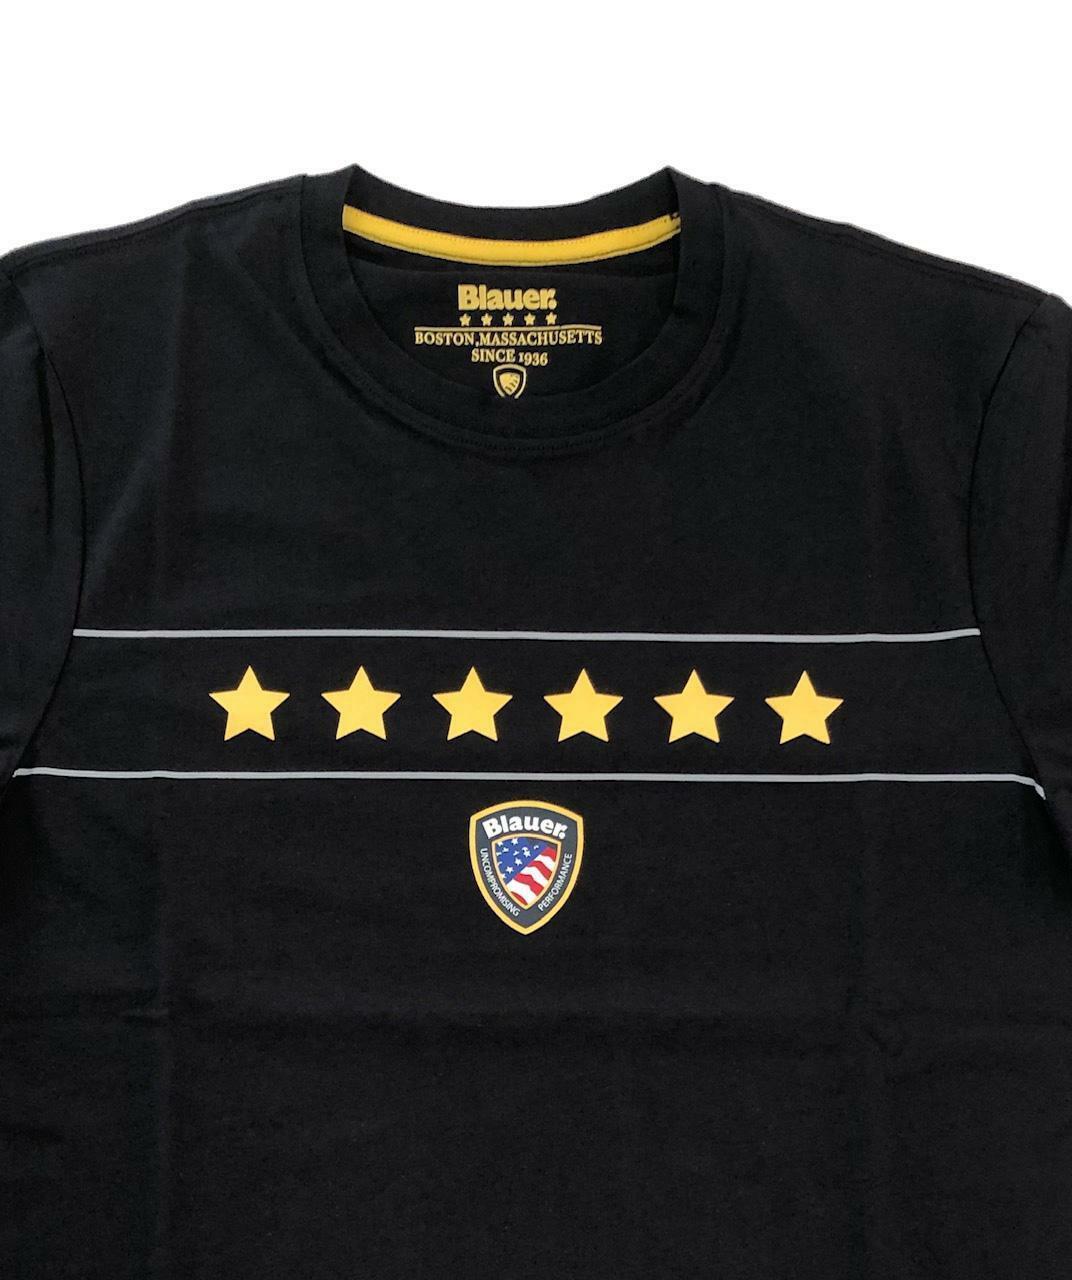 blauer t-shirt blauer uomo nero 20sbluh02167